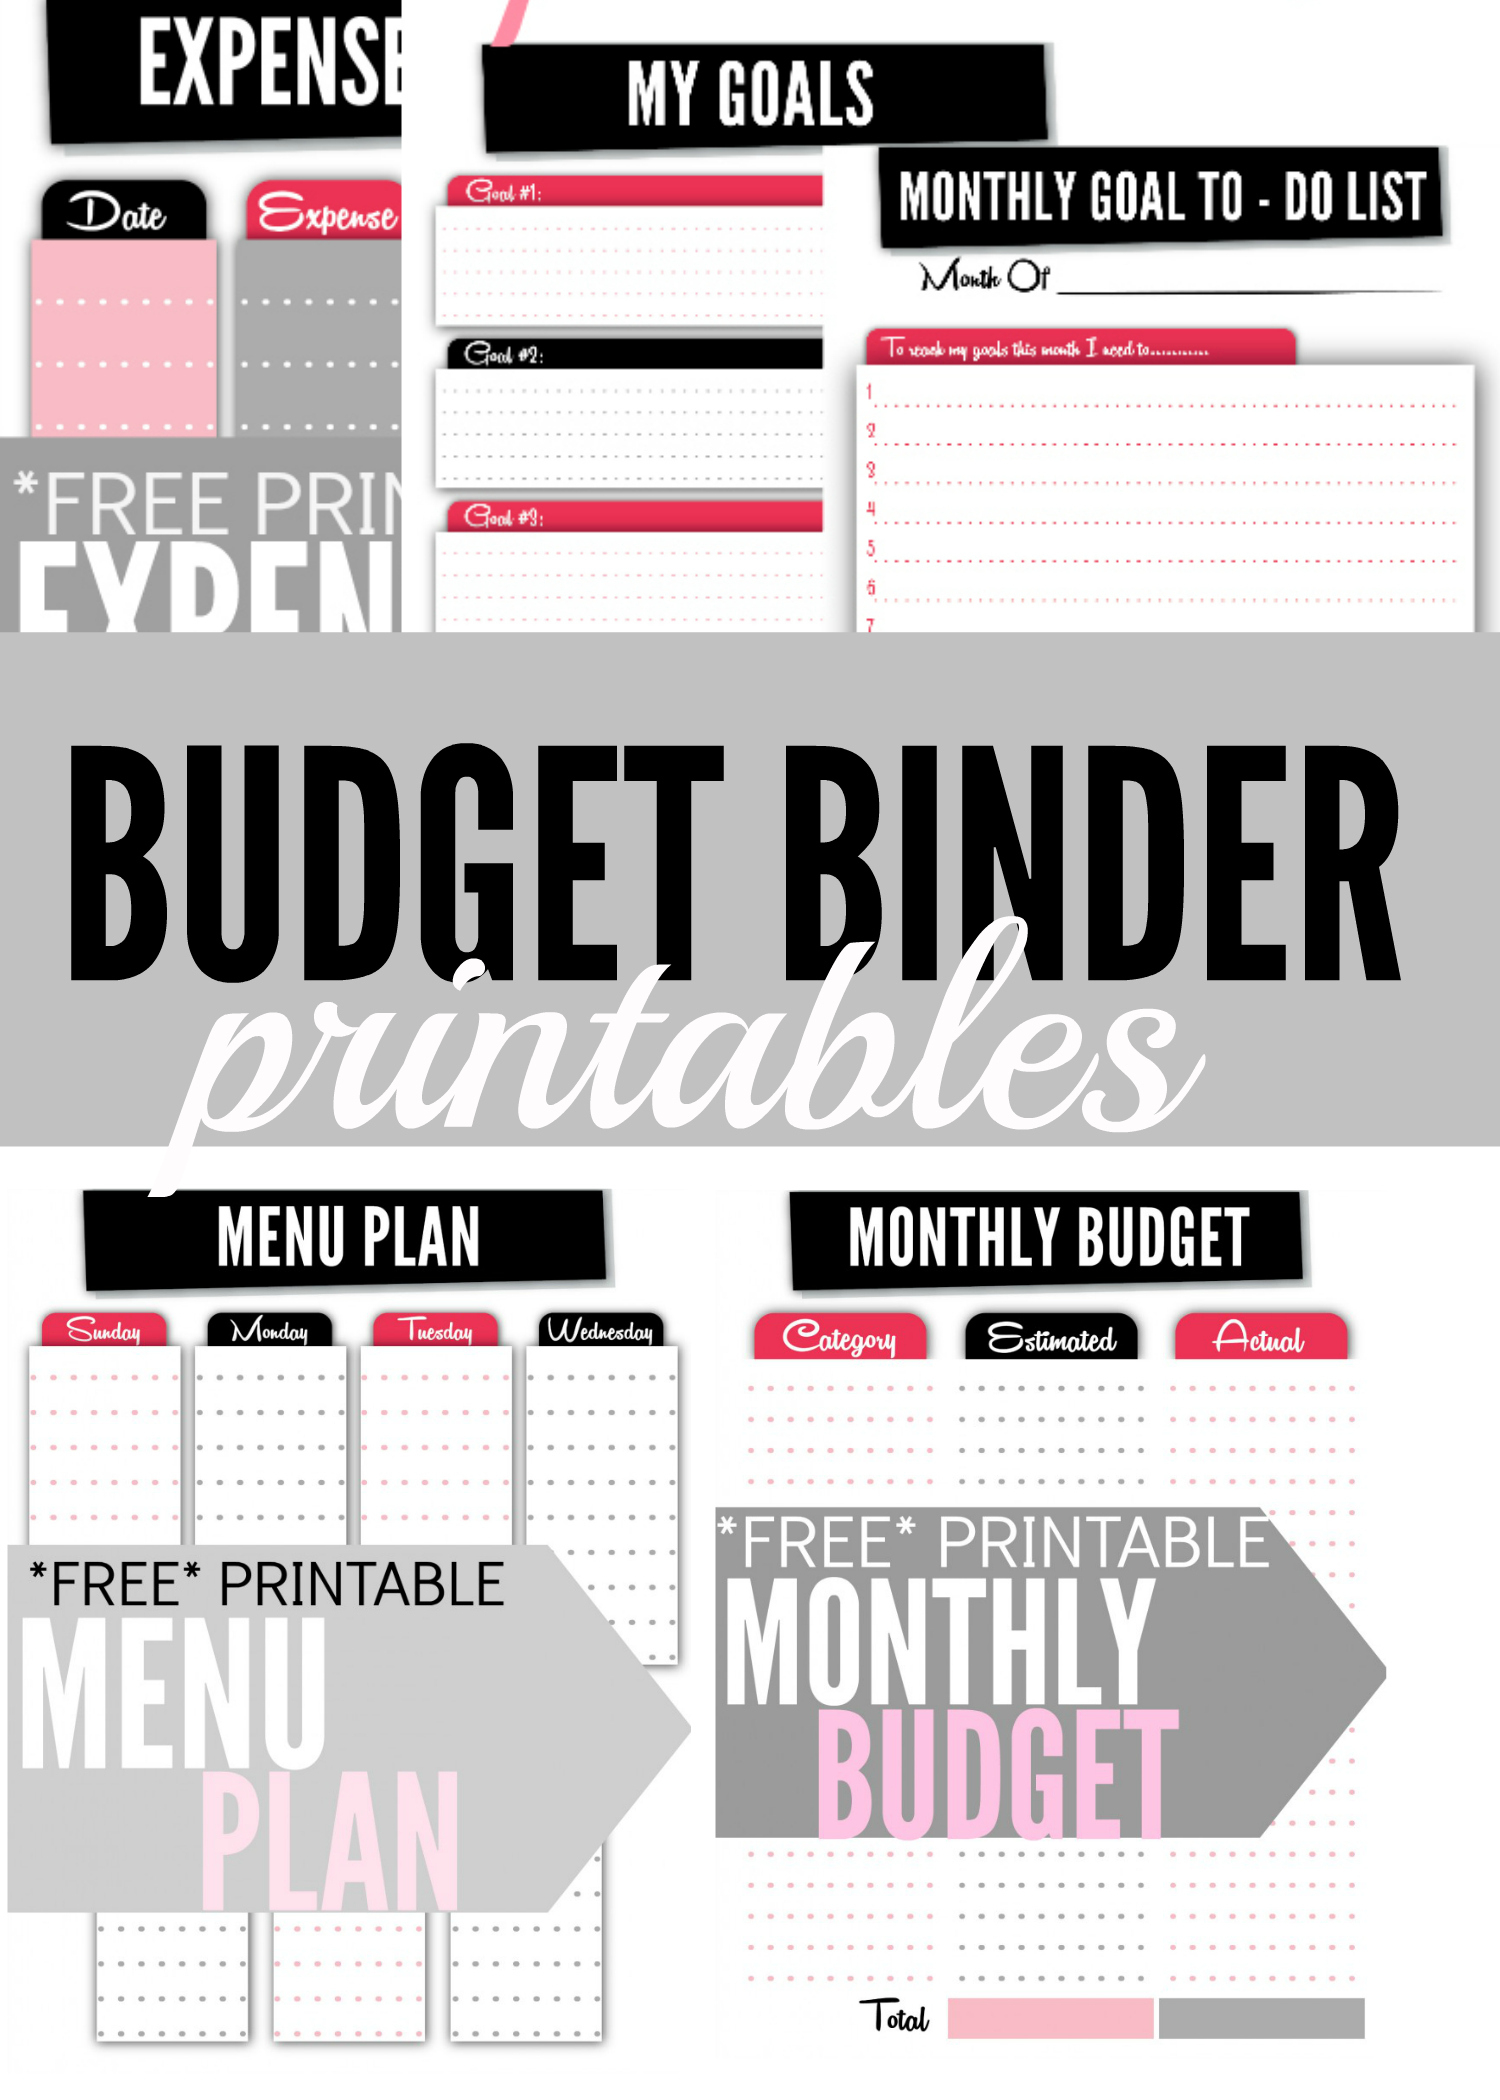 Budget Binder Printables - Single Moms Income - Free Printable Financial Binder